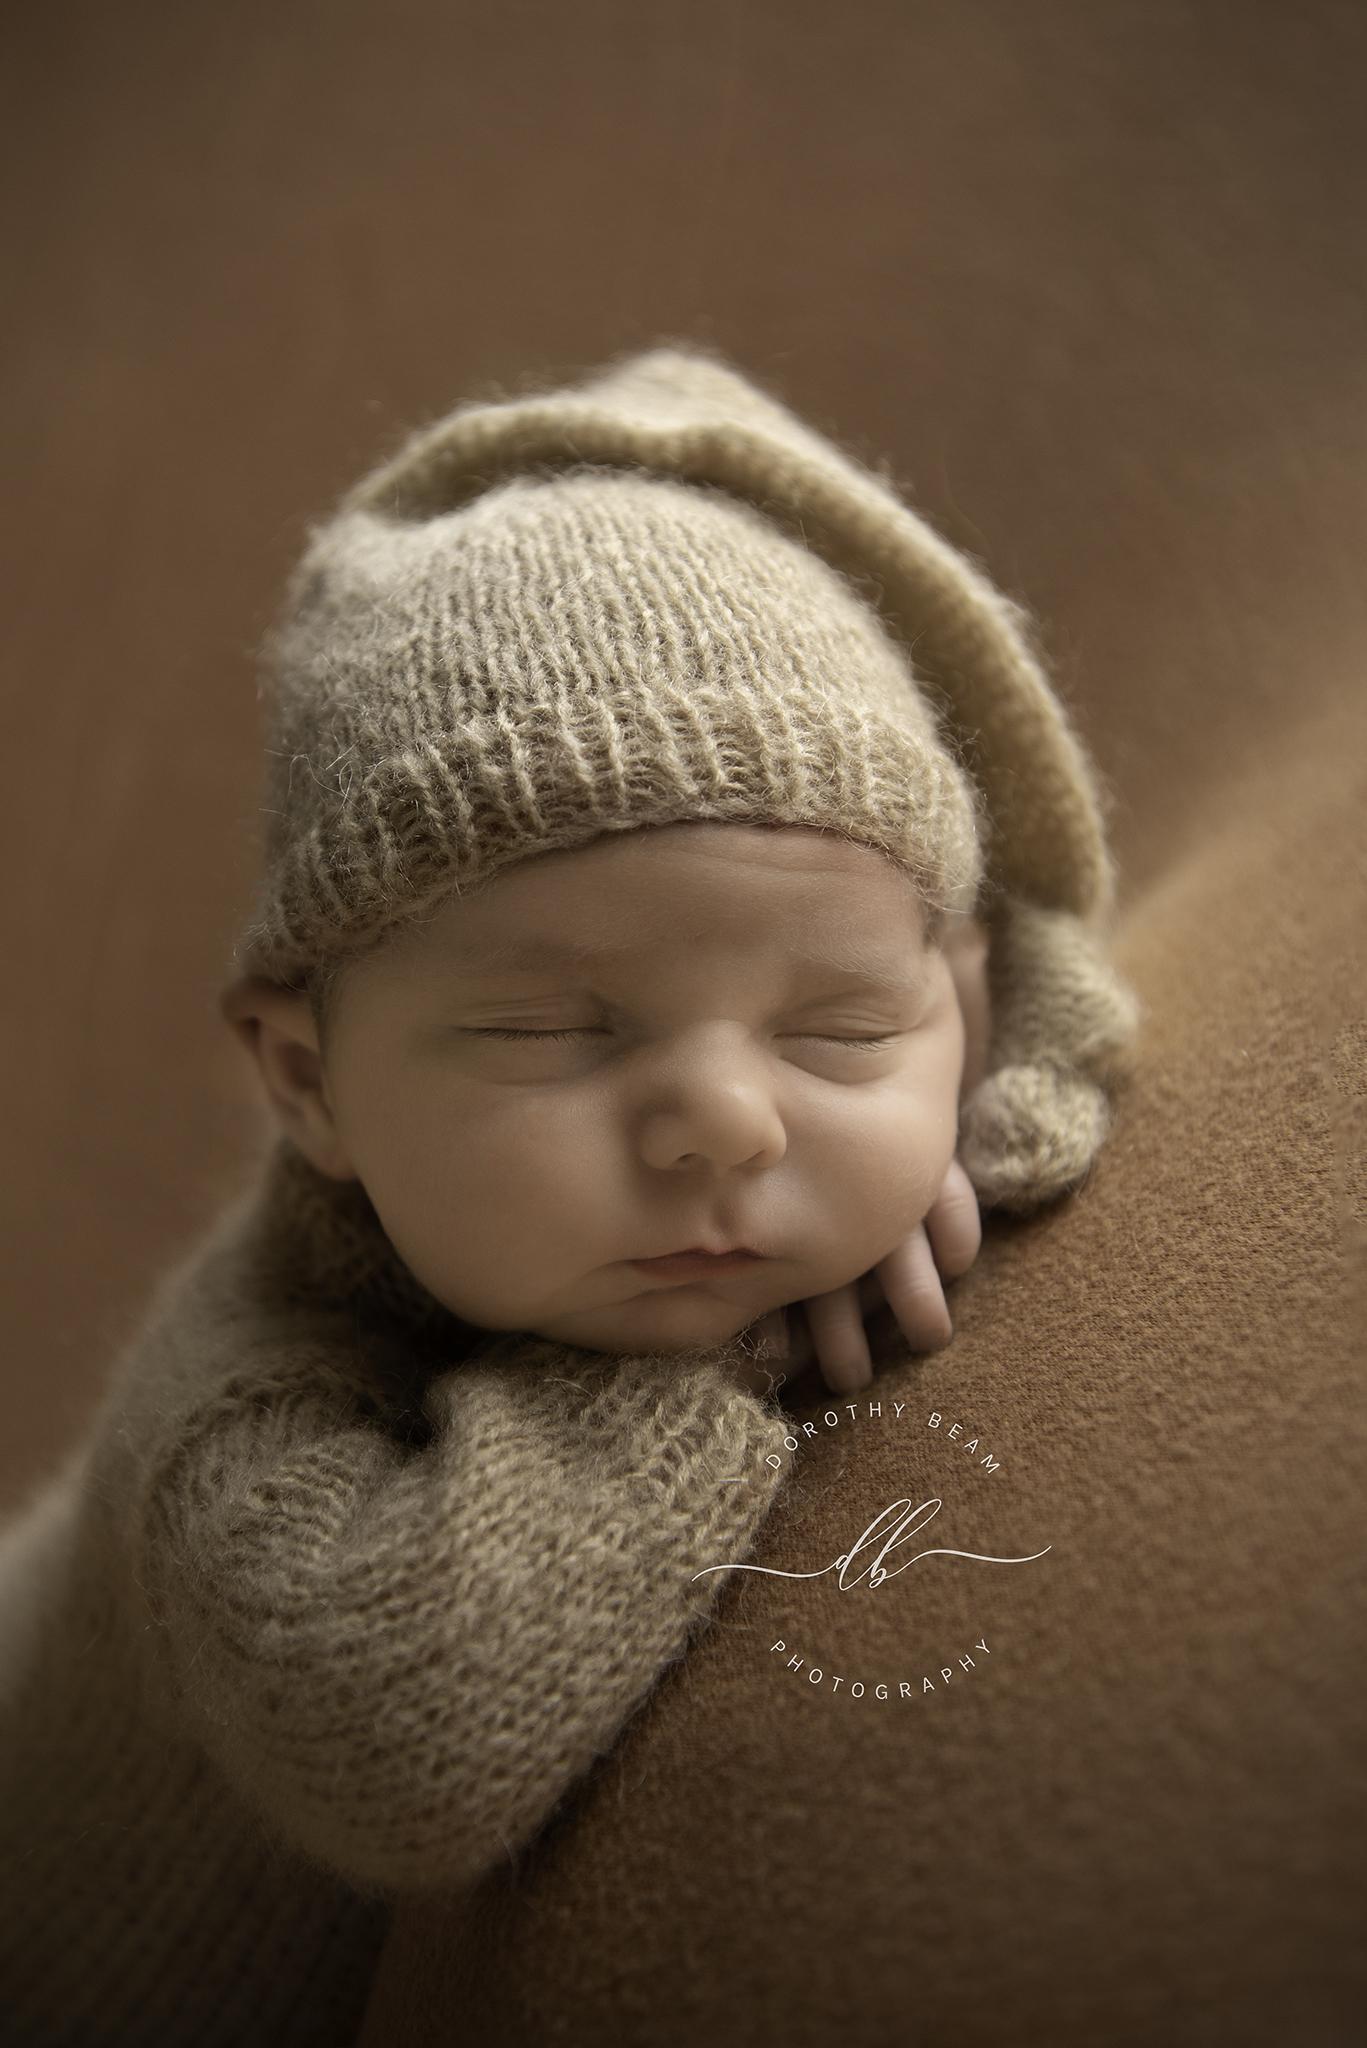 Boy Tan Knit Sleeper Hat Chin on Hands B